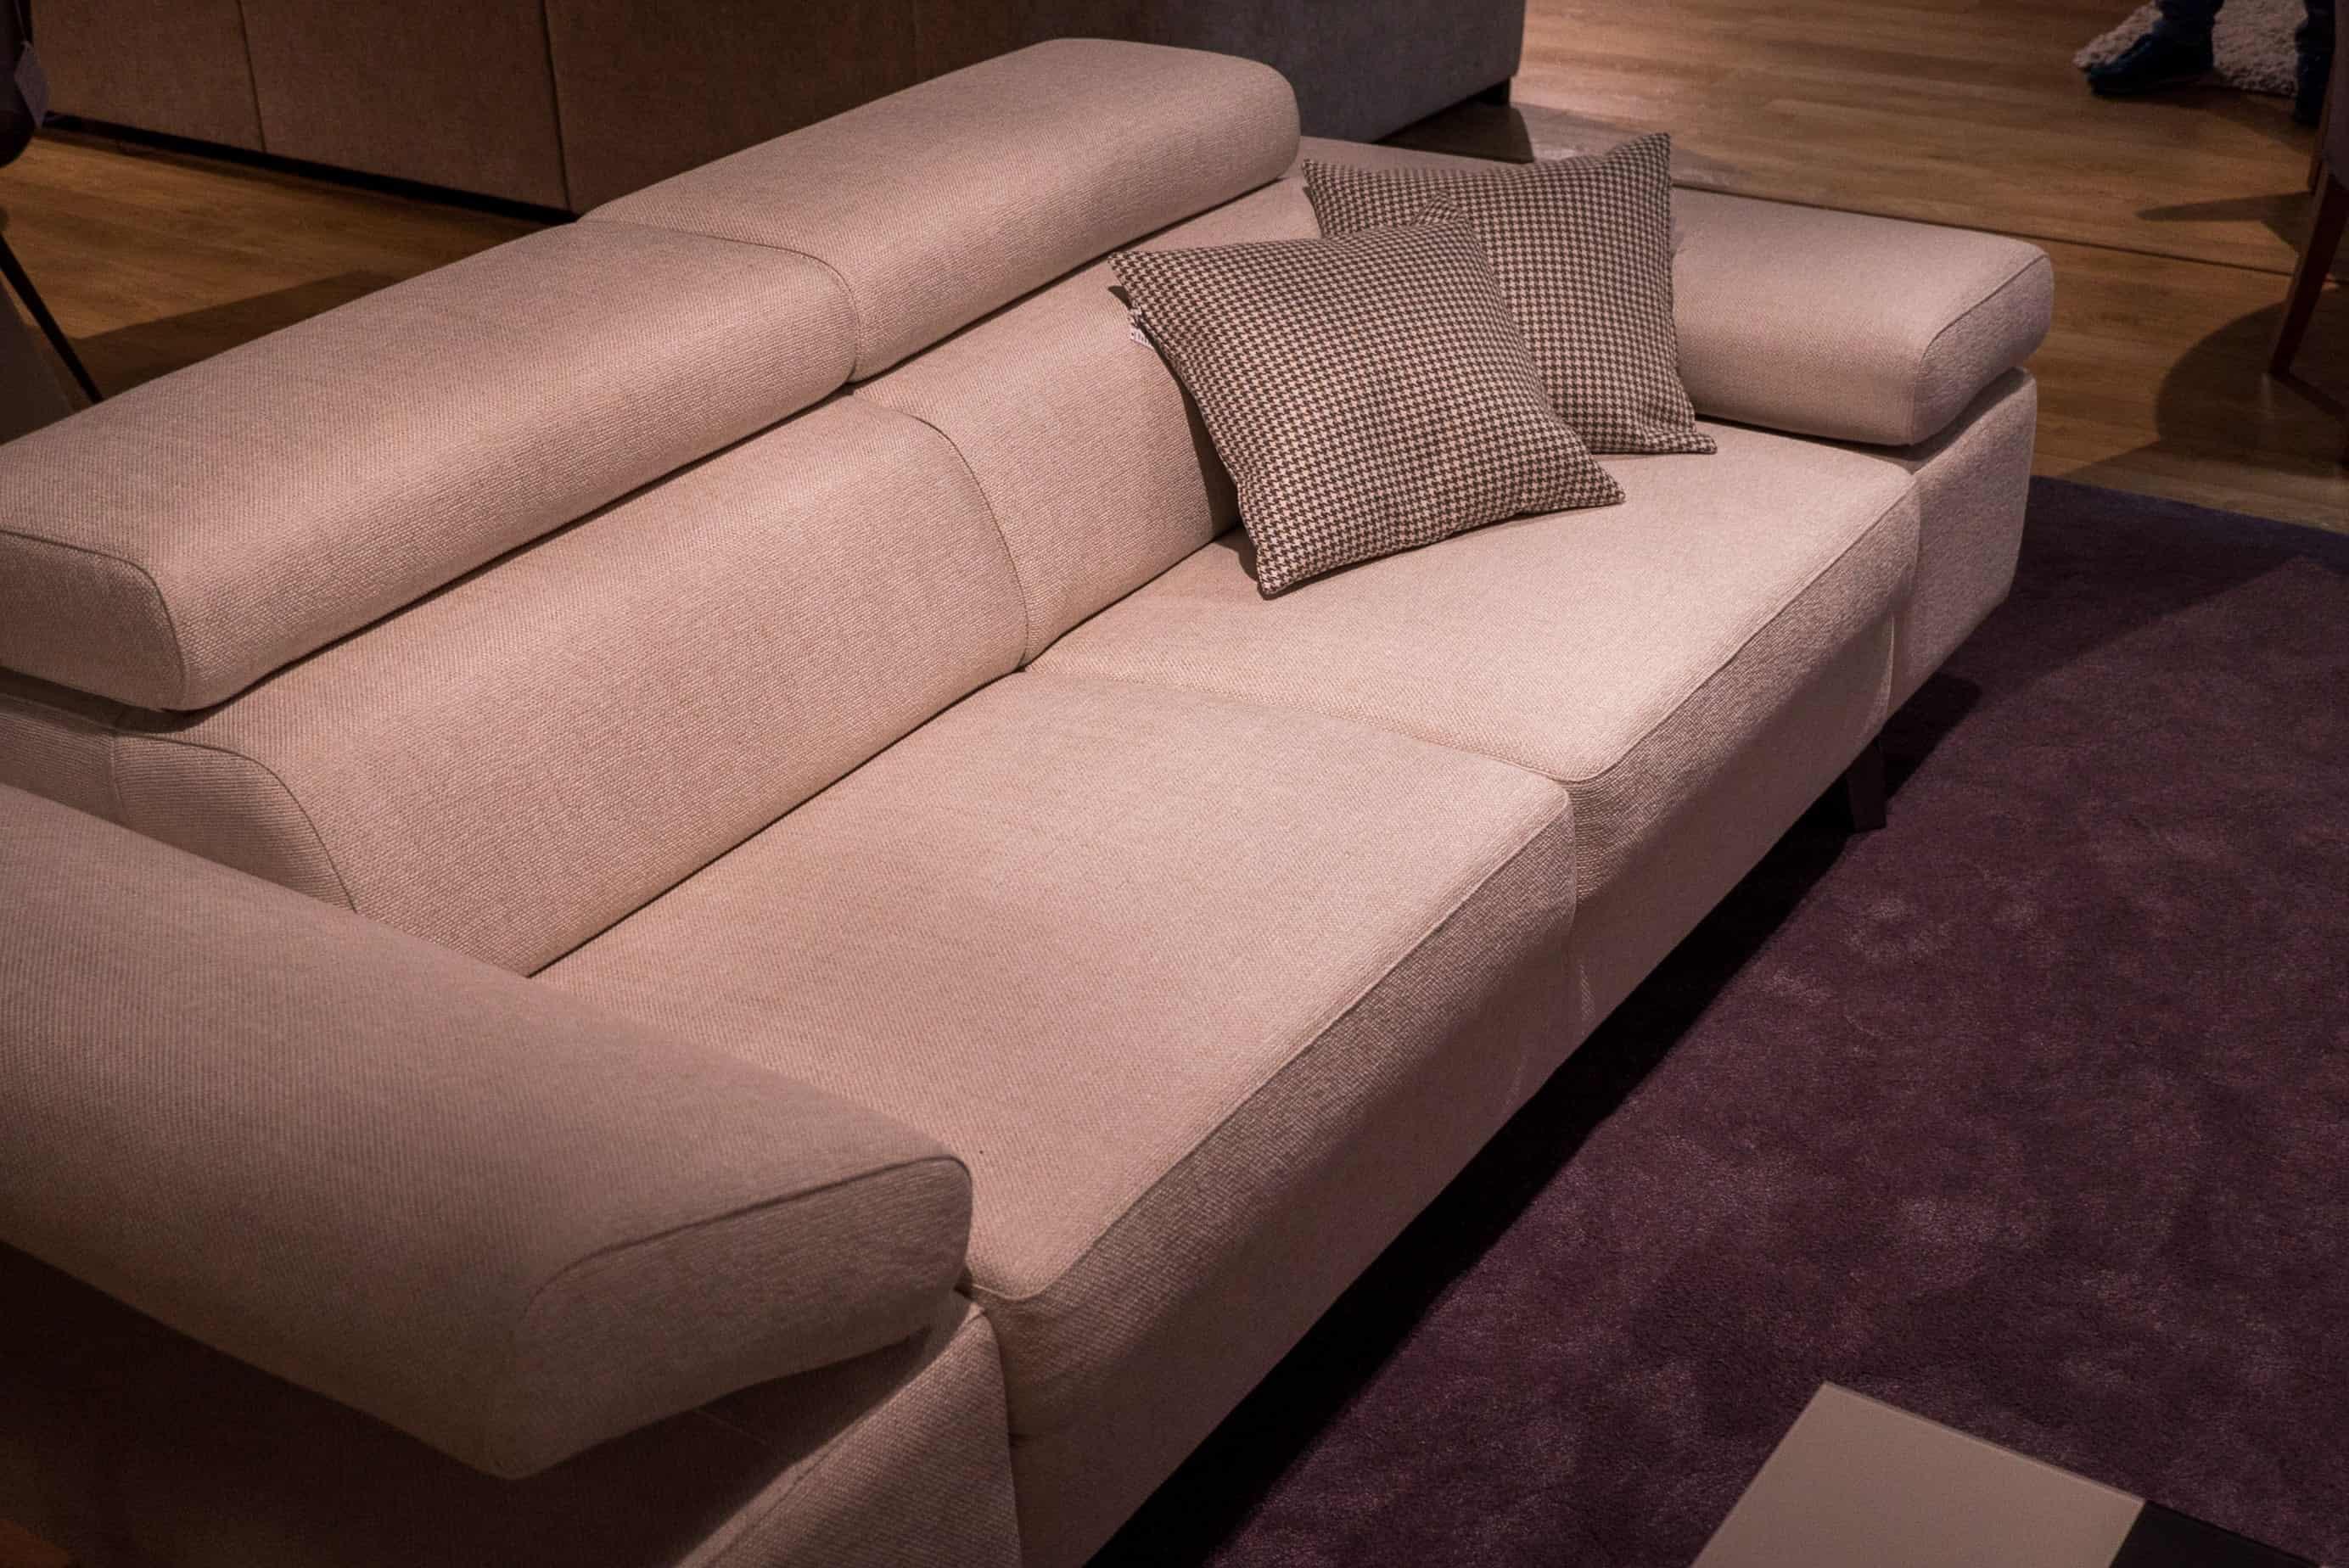 Millor Sofà   Mobles Güell